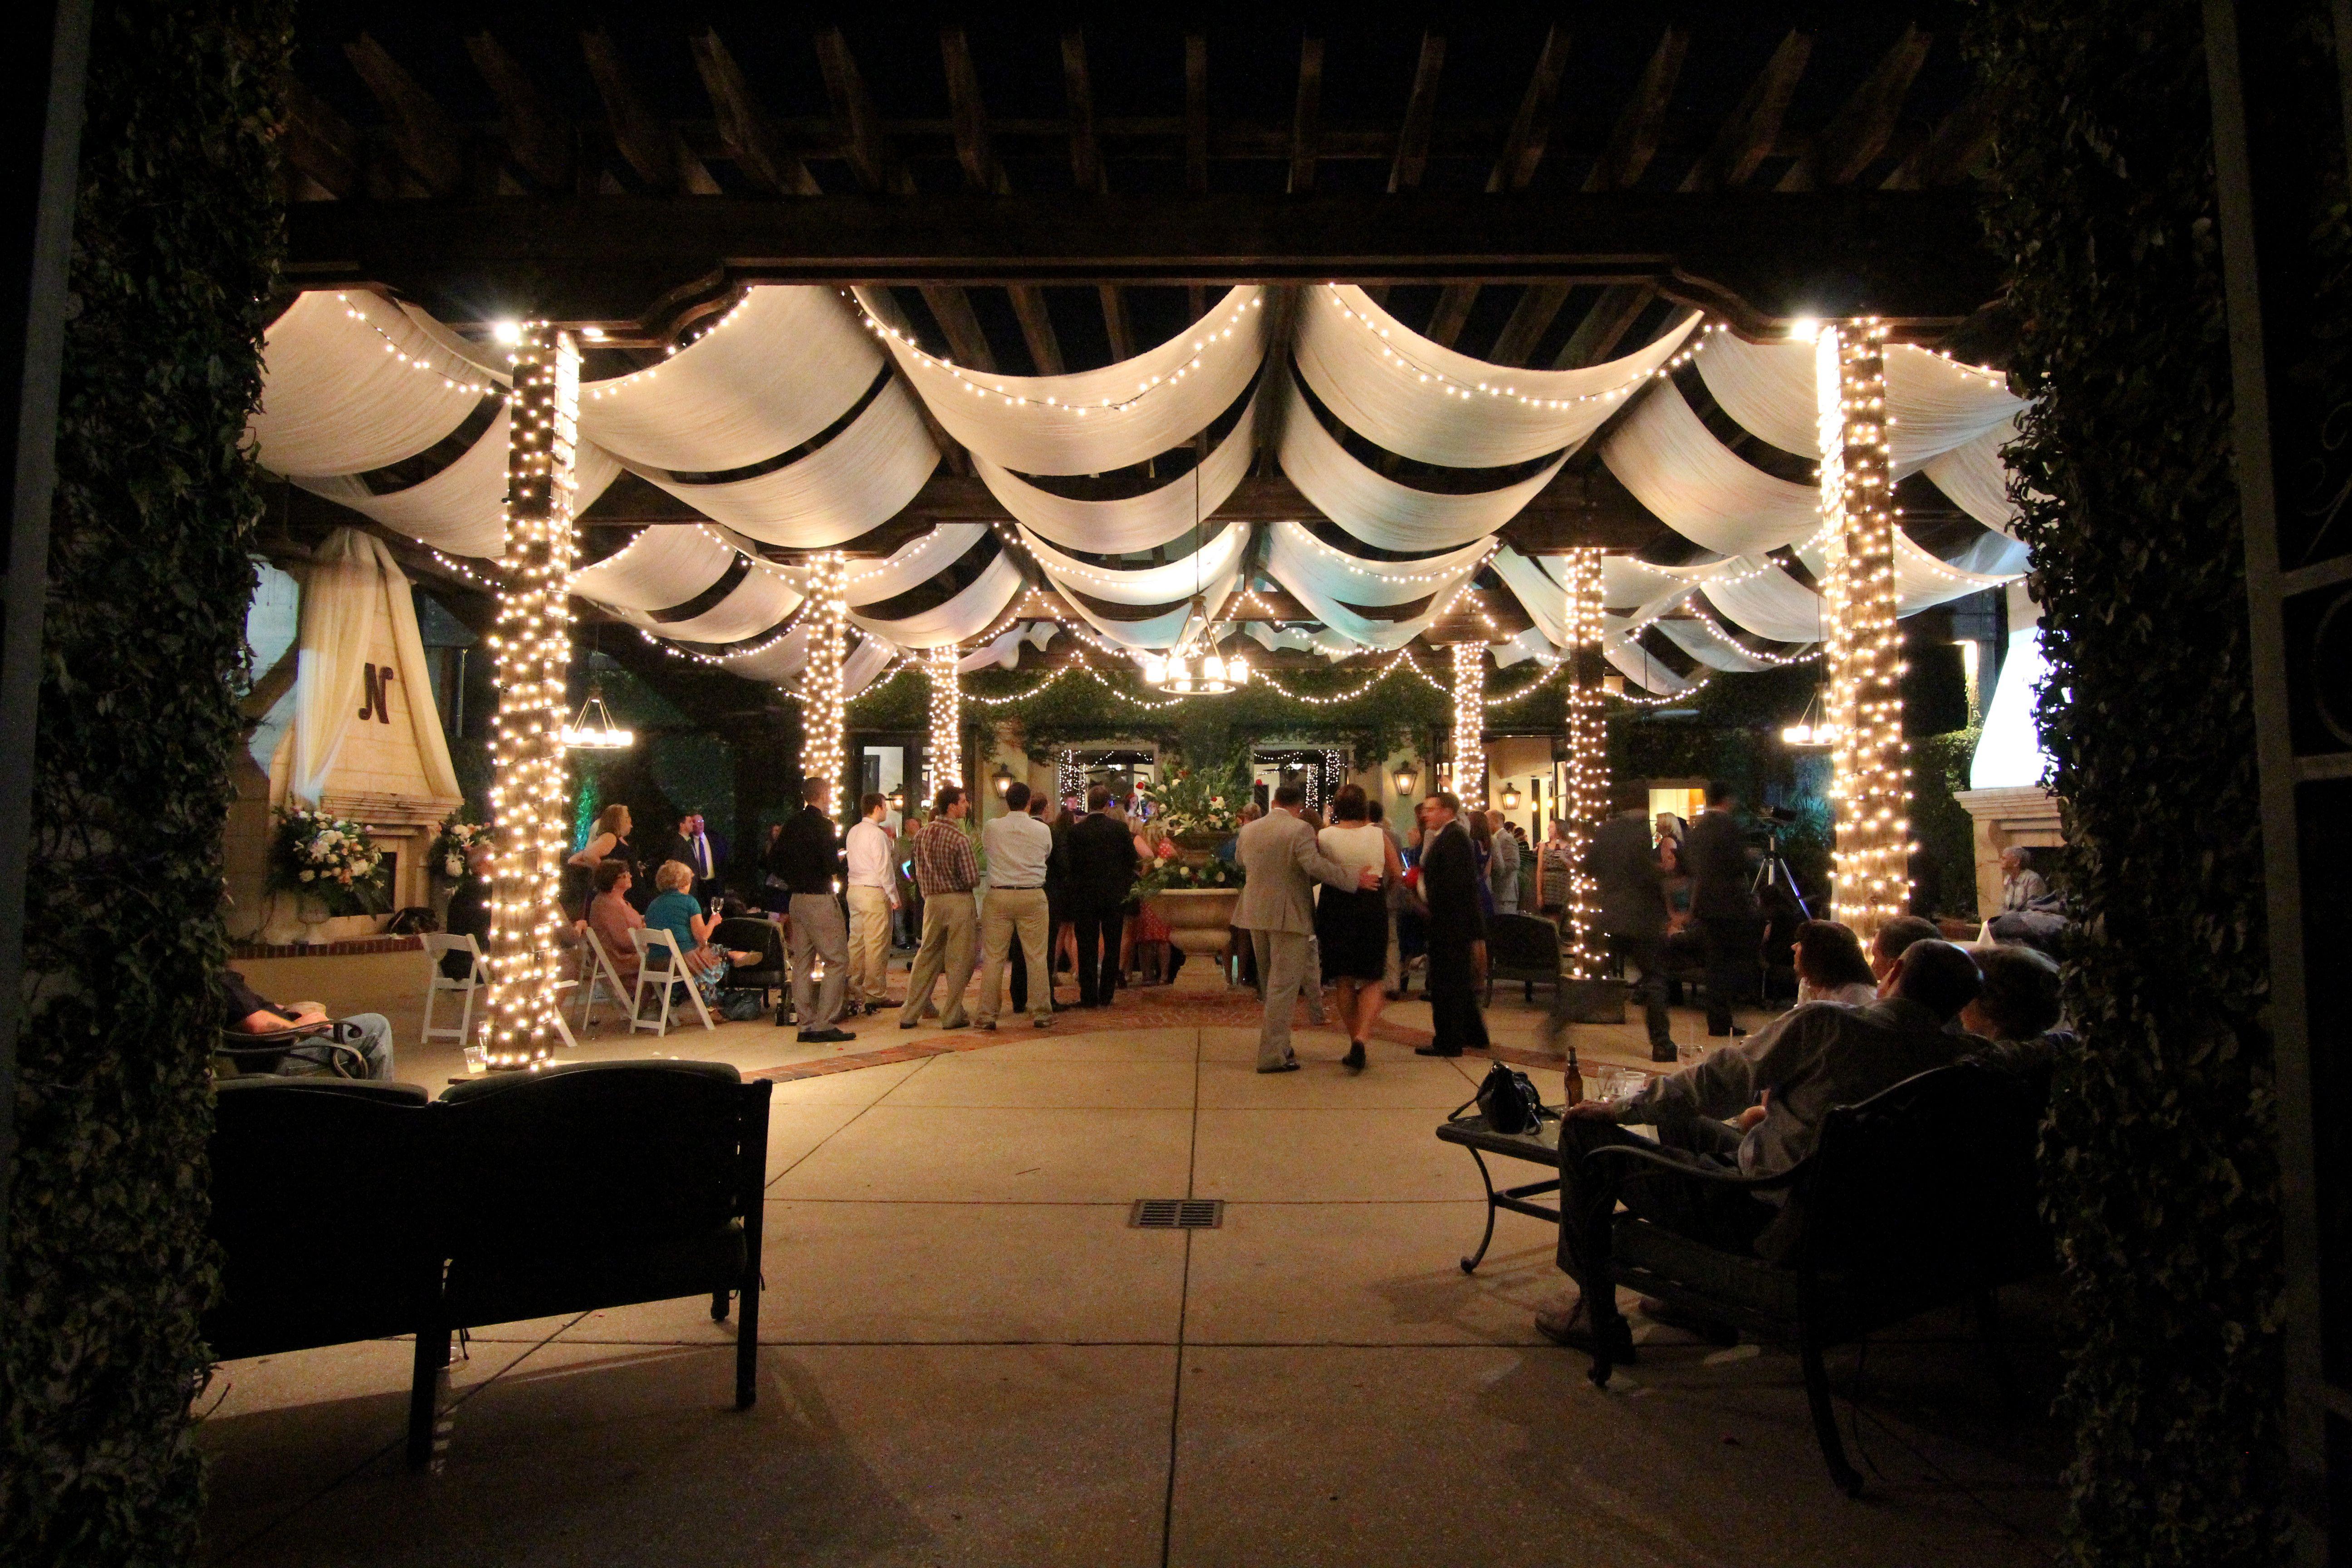 Mini Lights And Overhead Drapery Soften The Patio Of Azalea Manor In Mobile Al Wedding Reception Venues Pergola Lighting Pergola